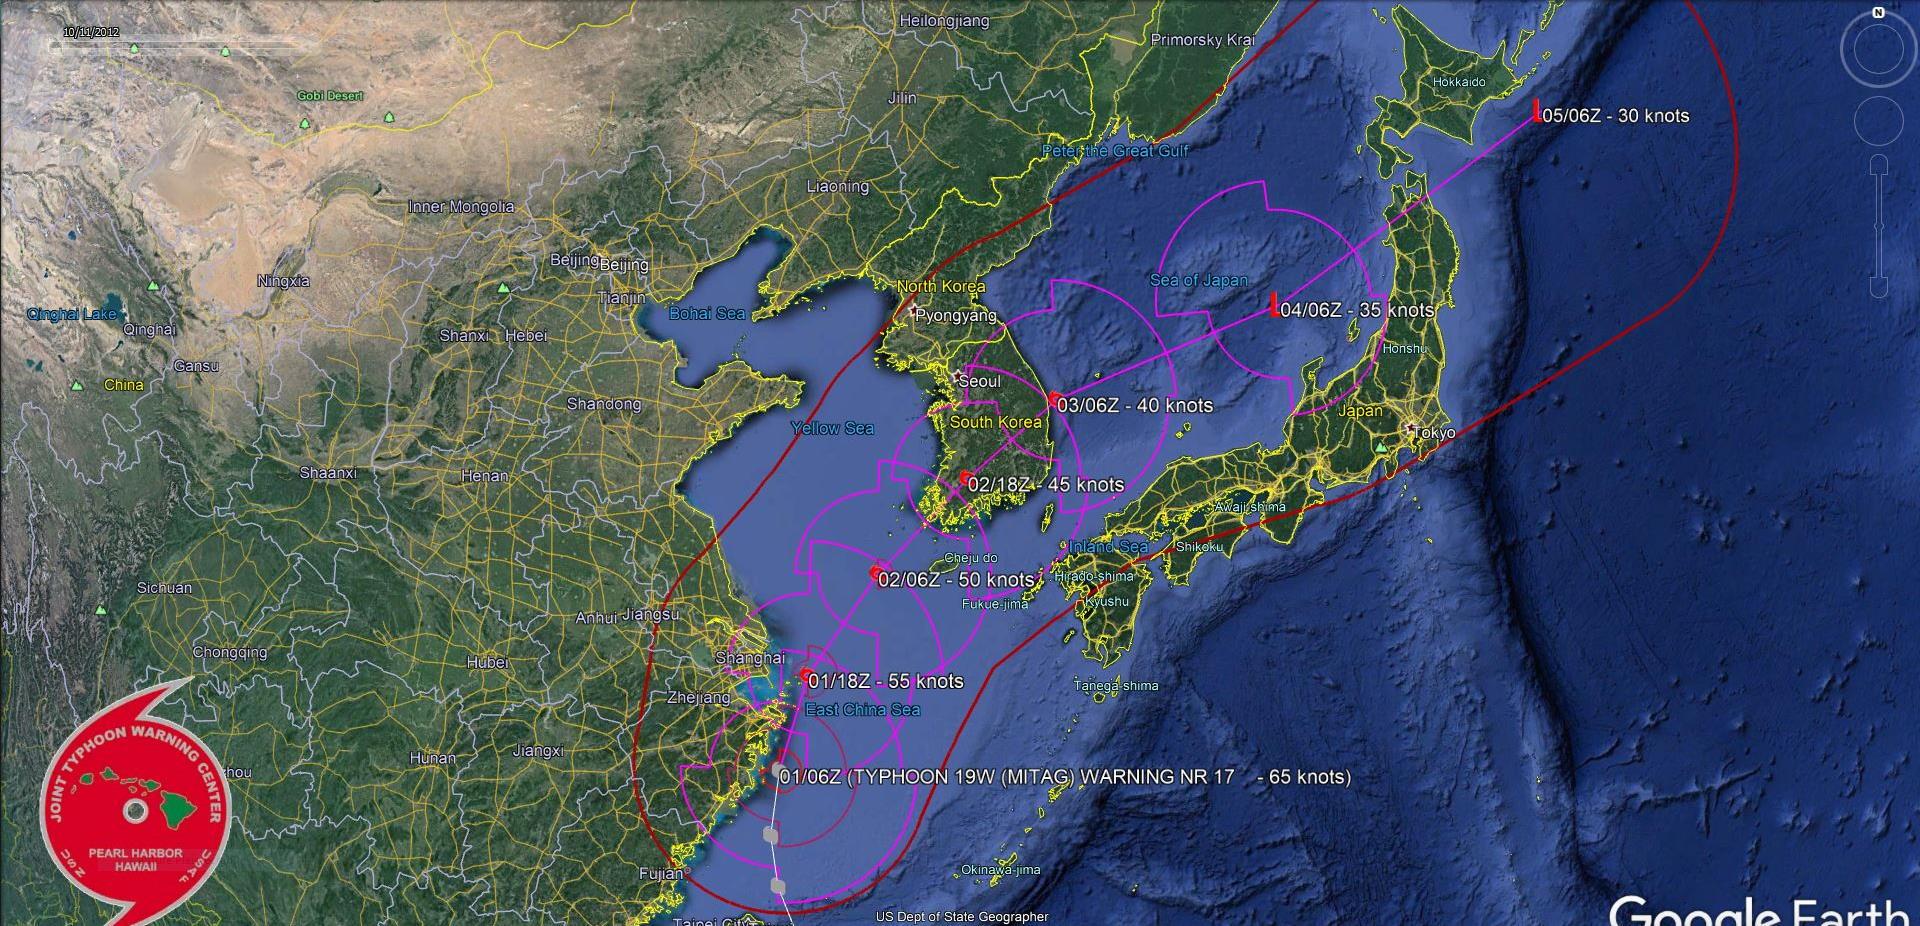 Mitag(19W) tracking close to the Chinese coastline, weakening next 48h